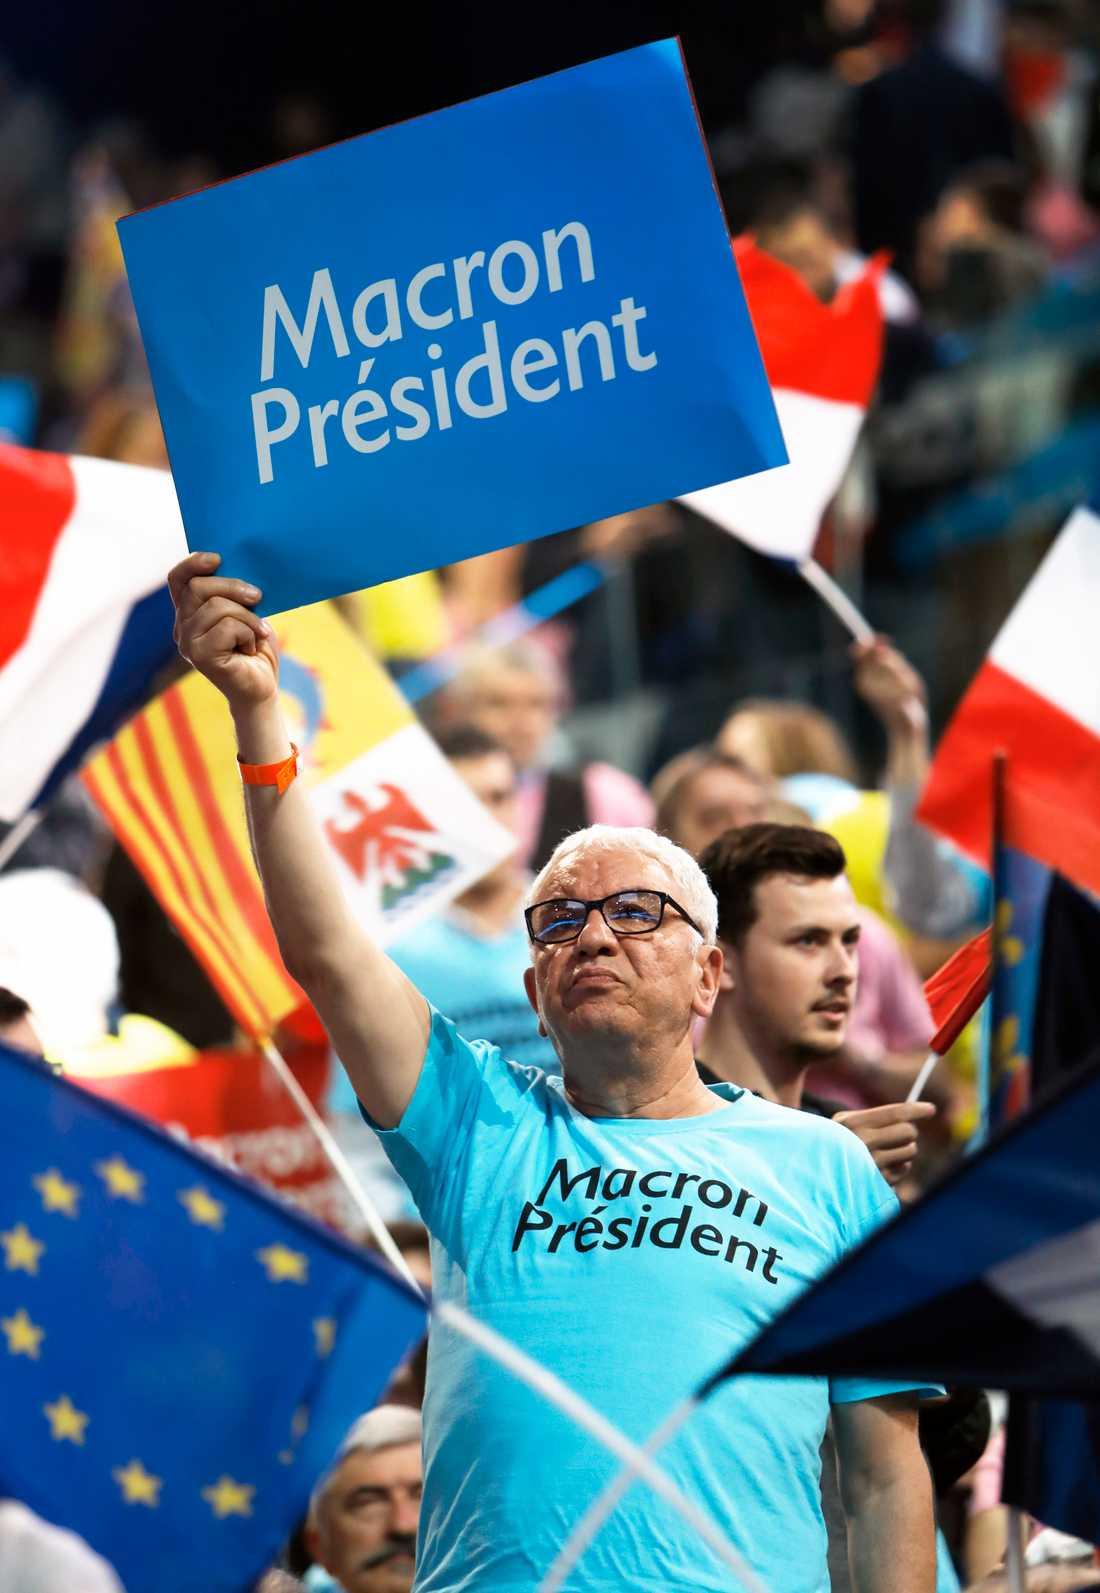 Emanuelle Macron tog emot folkets jubel vid sitt valmöte.